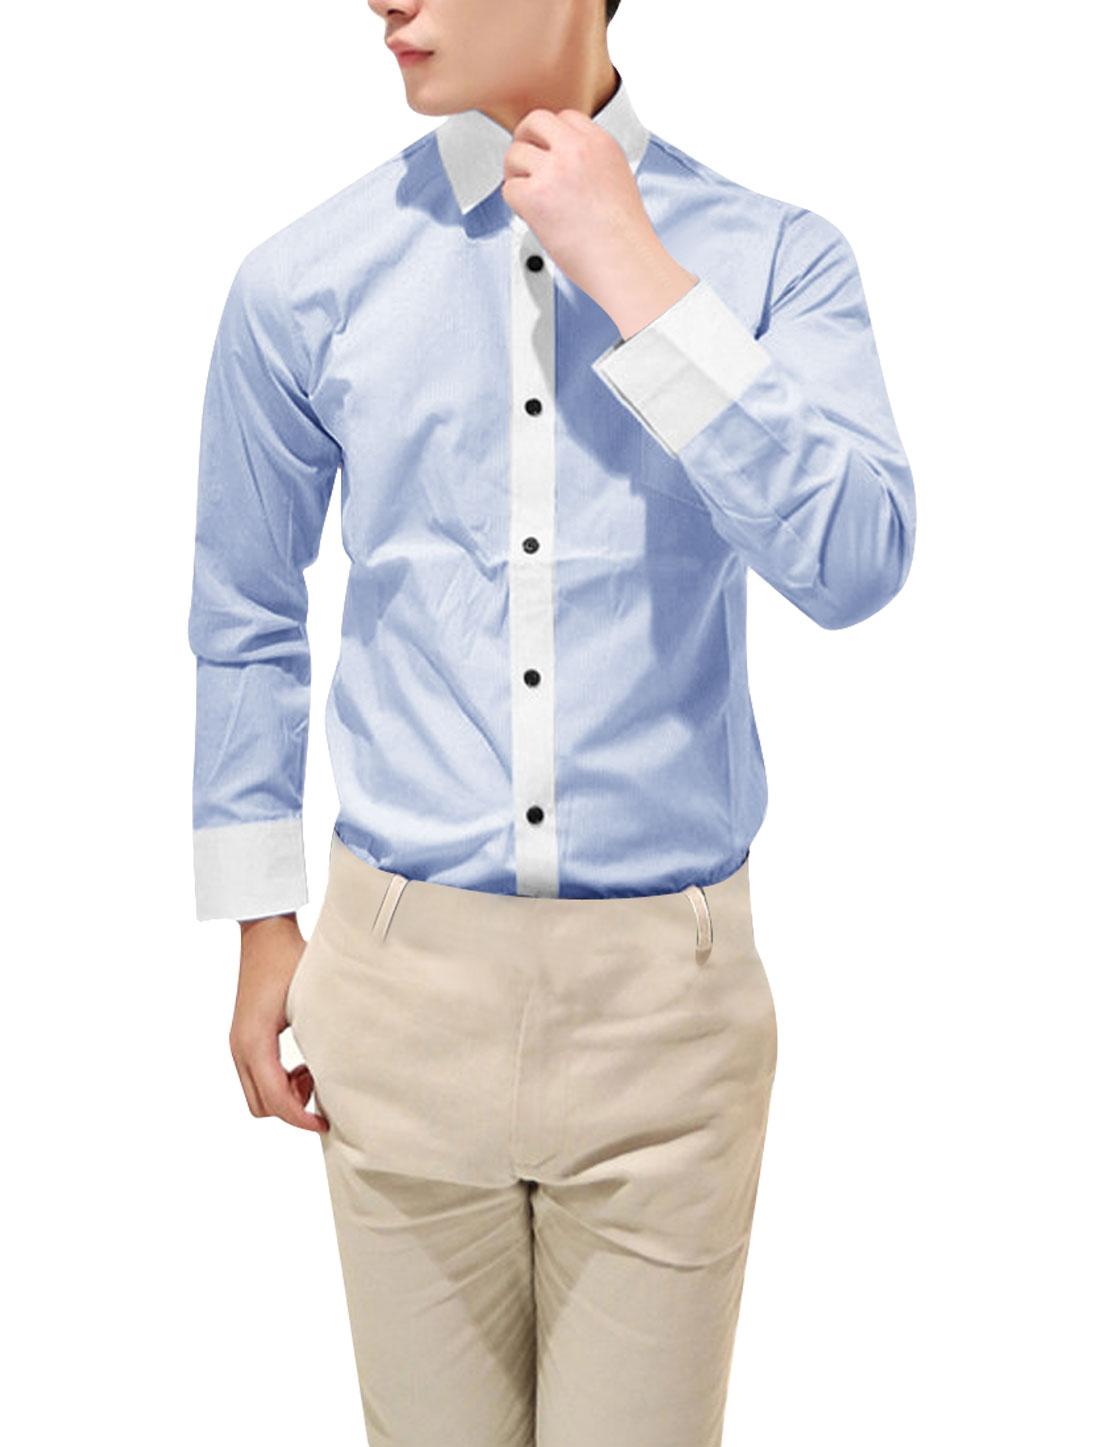 Men Light Blue White Vertical Striped Slim Fit Button Down Shirt M